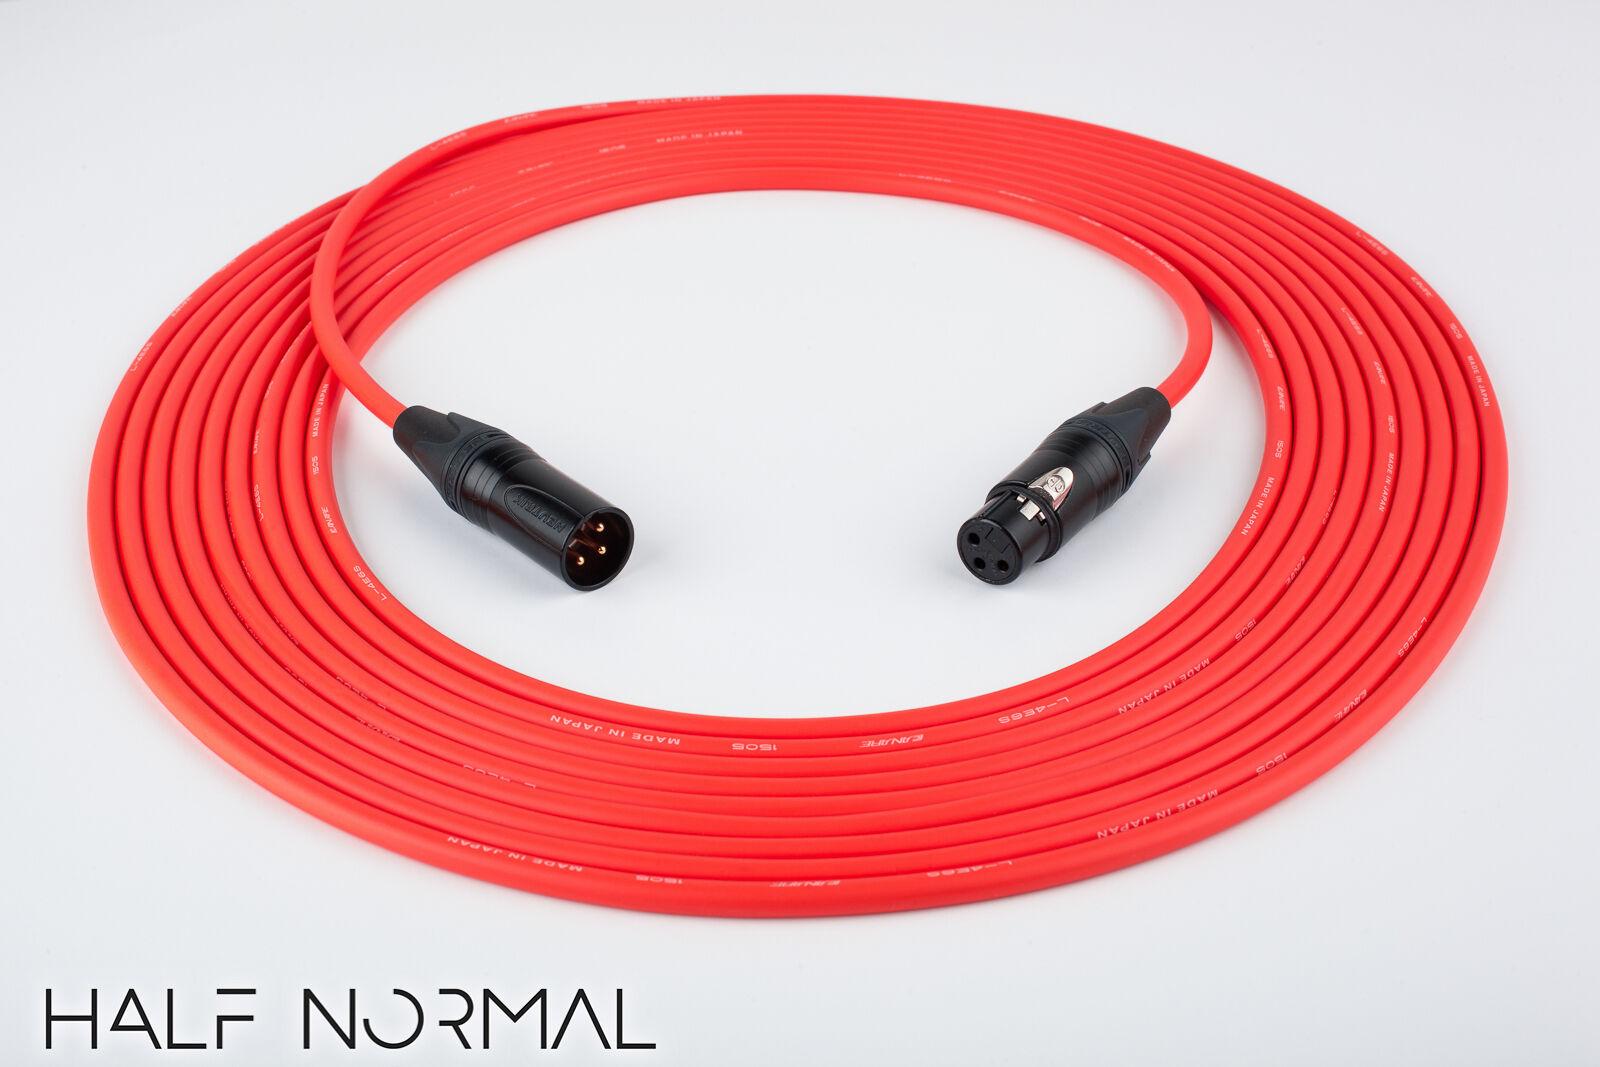 50' Canare L-4E6S Quad Balanced Cable Neutrik Gold XLR Male to XLR Female rot